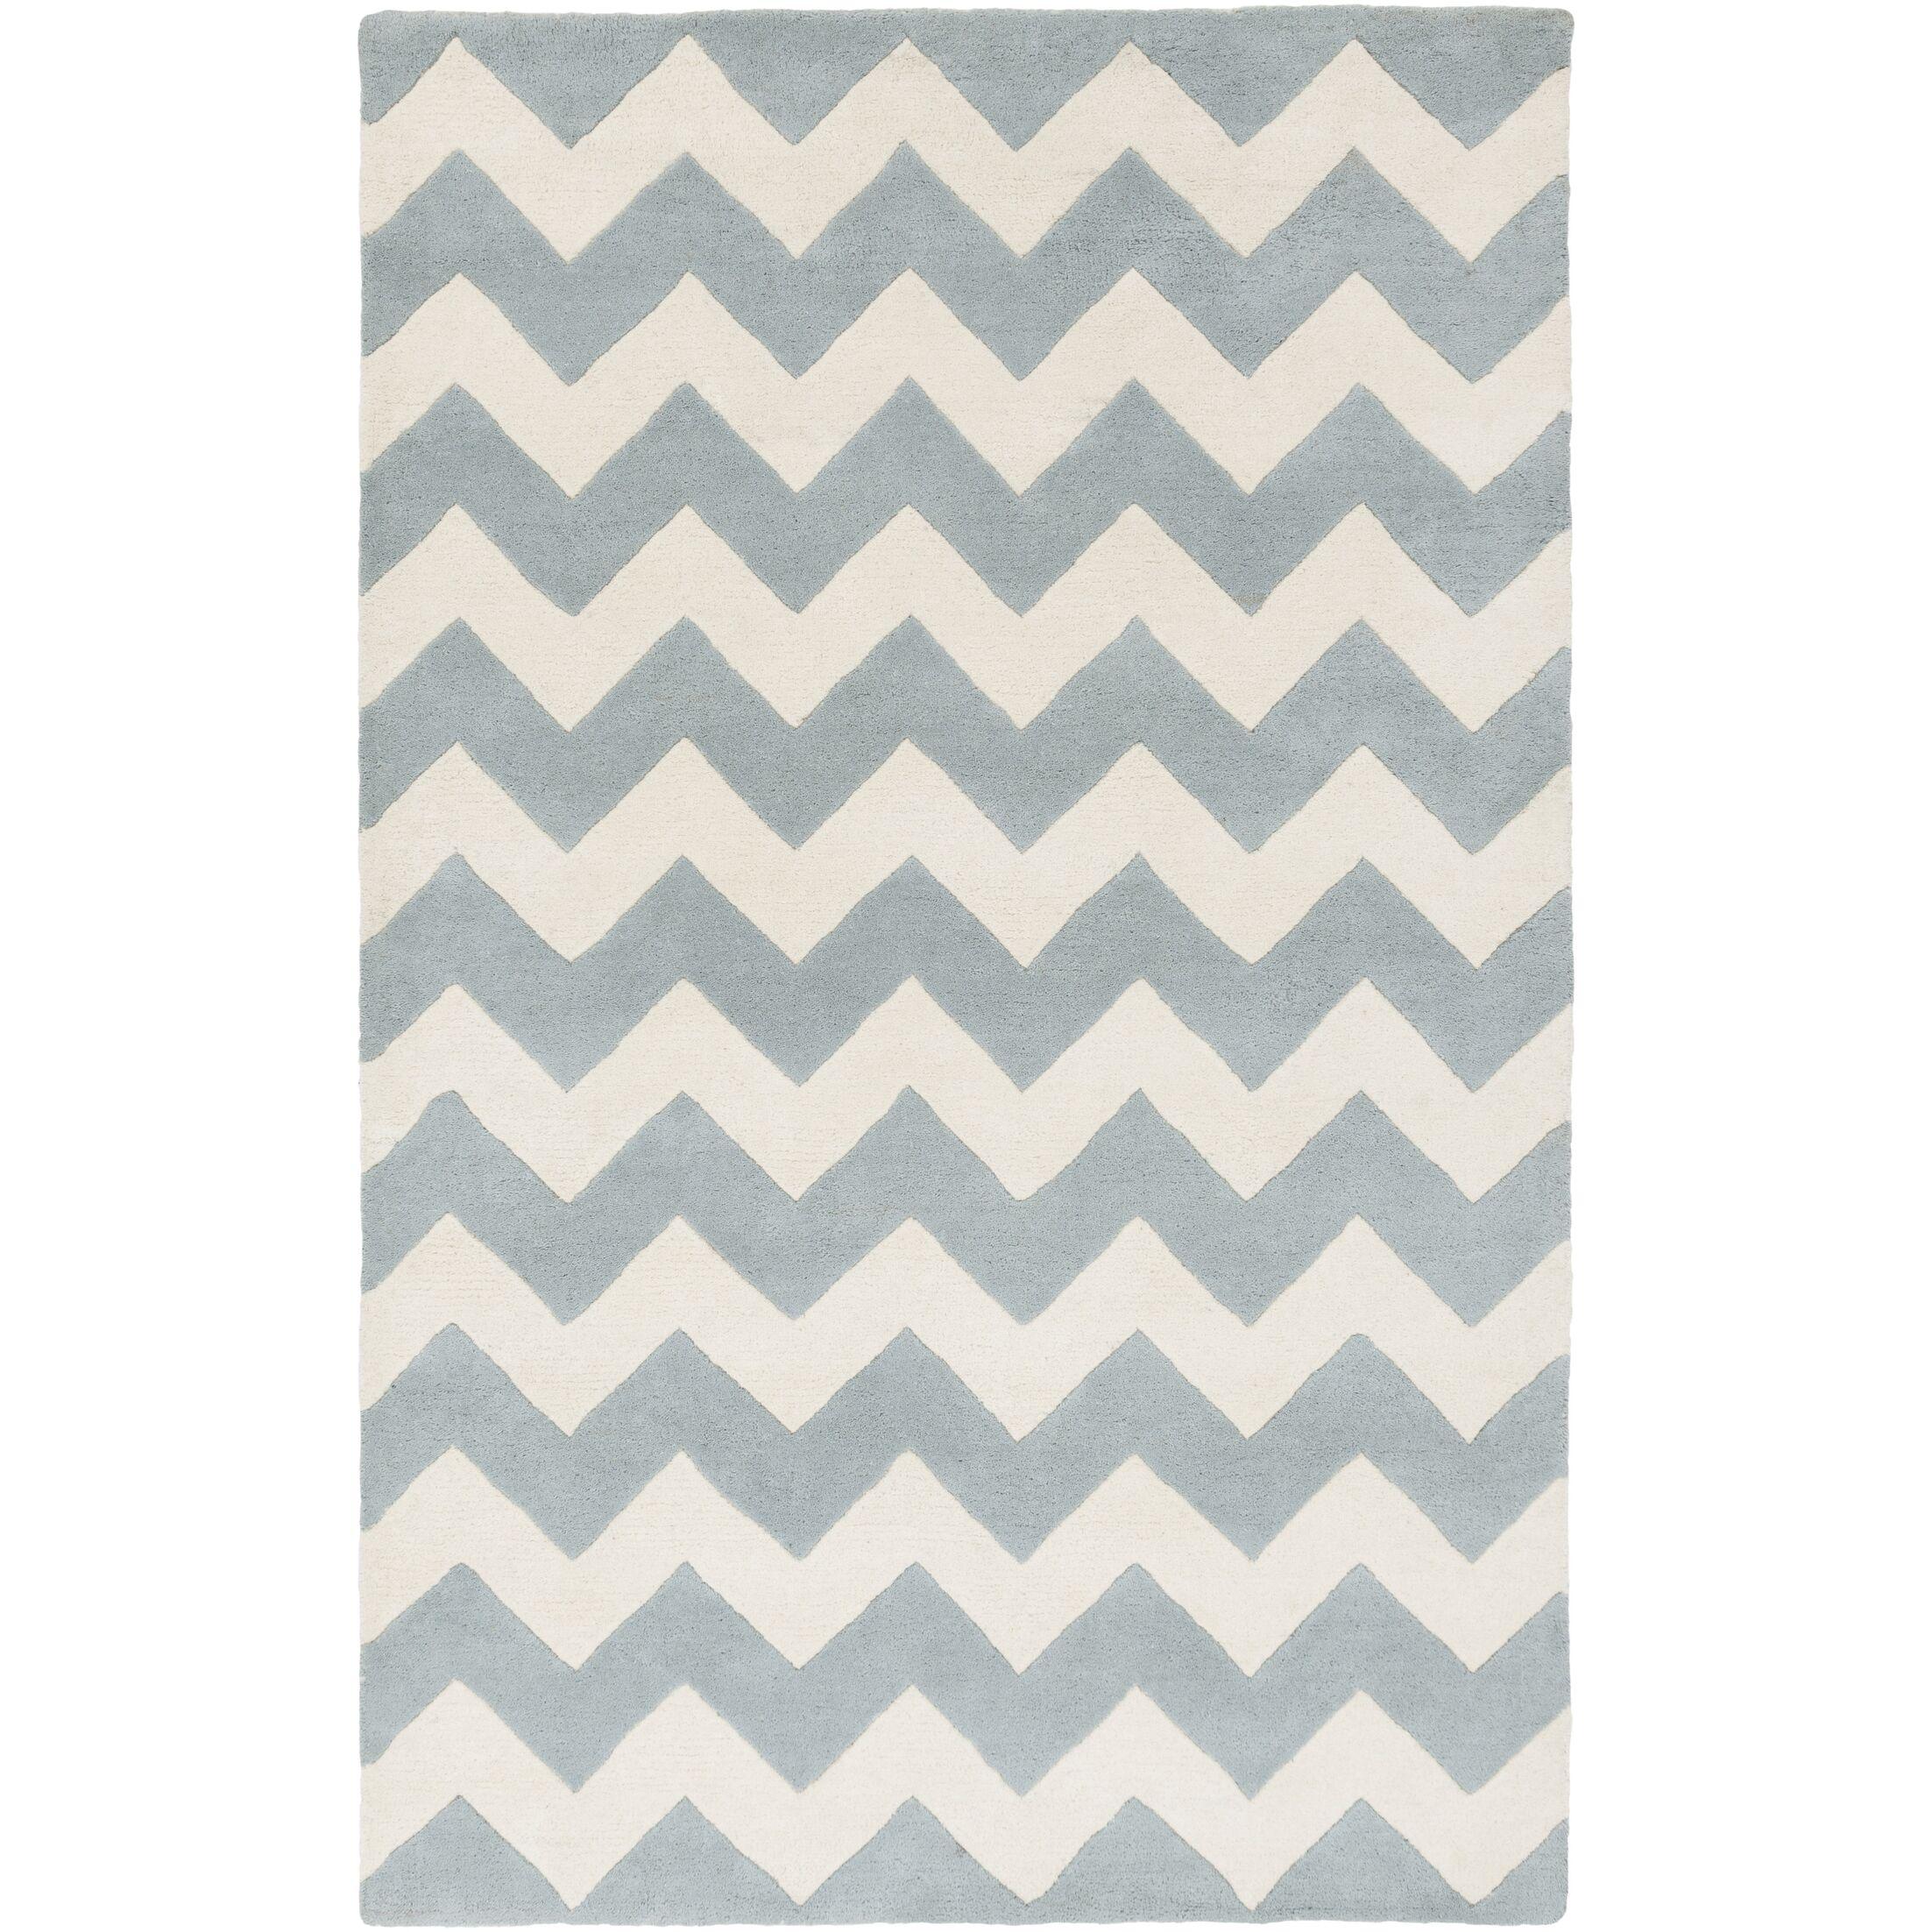 Ayler Blue/Ivory Chevron Area Rug Rug Size: Rectangle 7'6